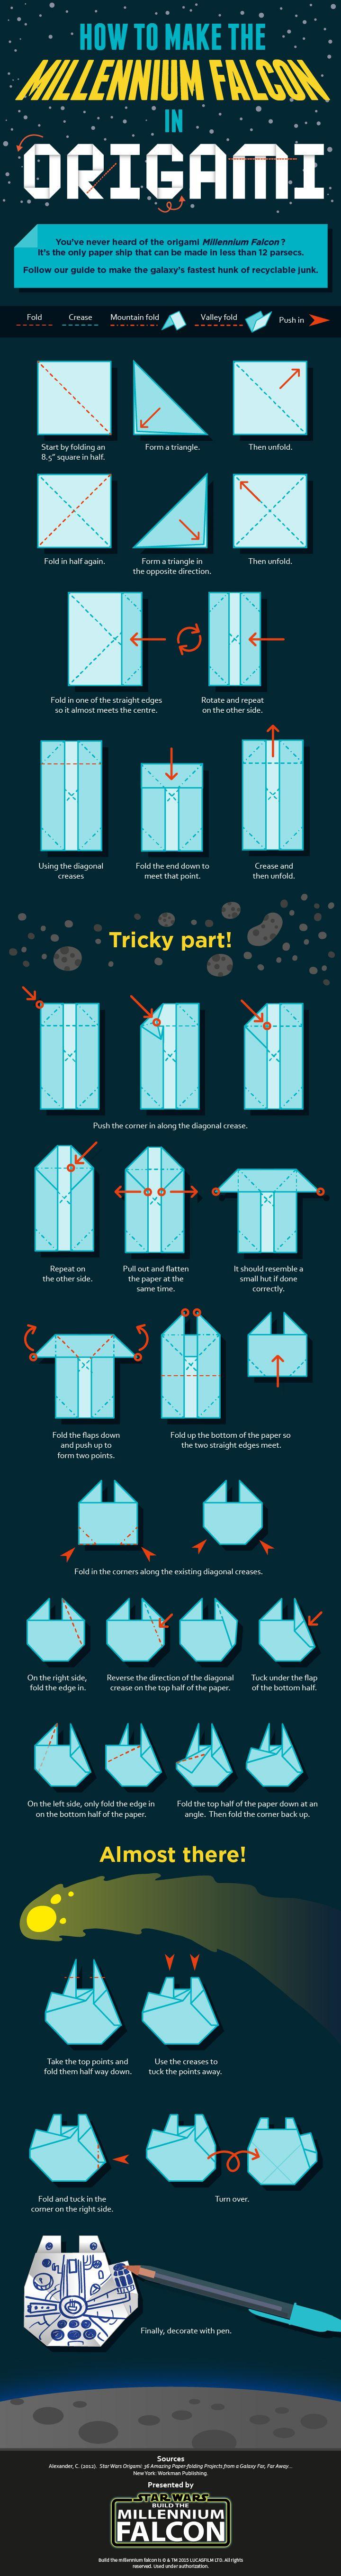 Make a Millennium Falcon in origami | Step guide, Falcons ... - photo#28